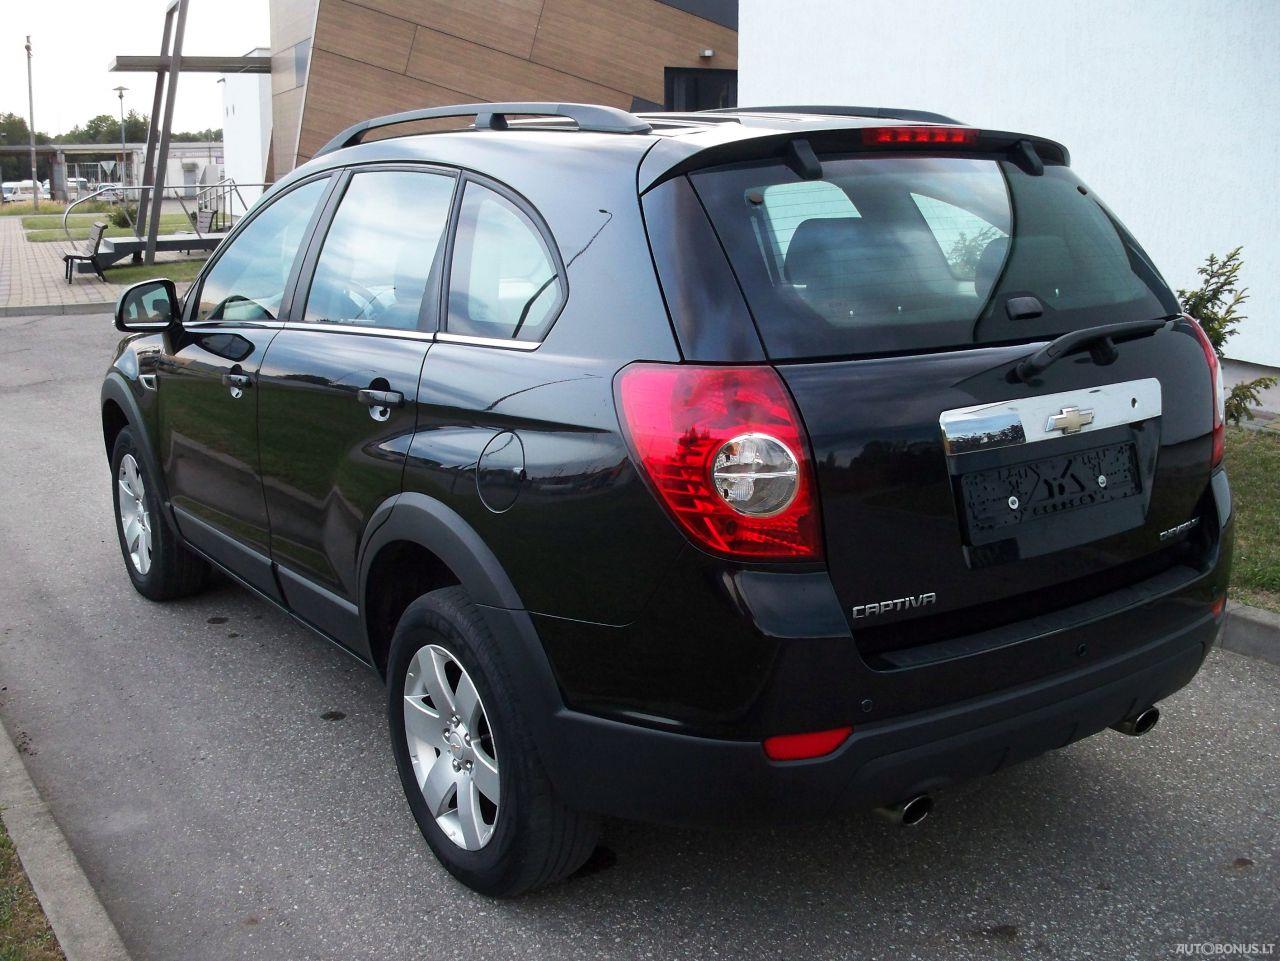 Chevrolet Captiva, Visureigis, 2011-12 | 2